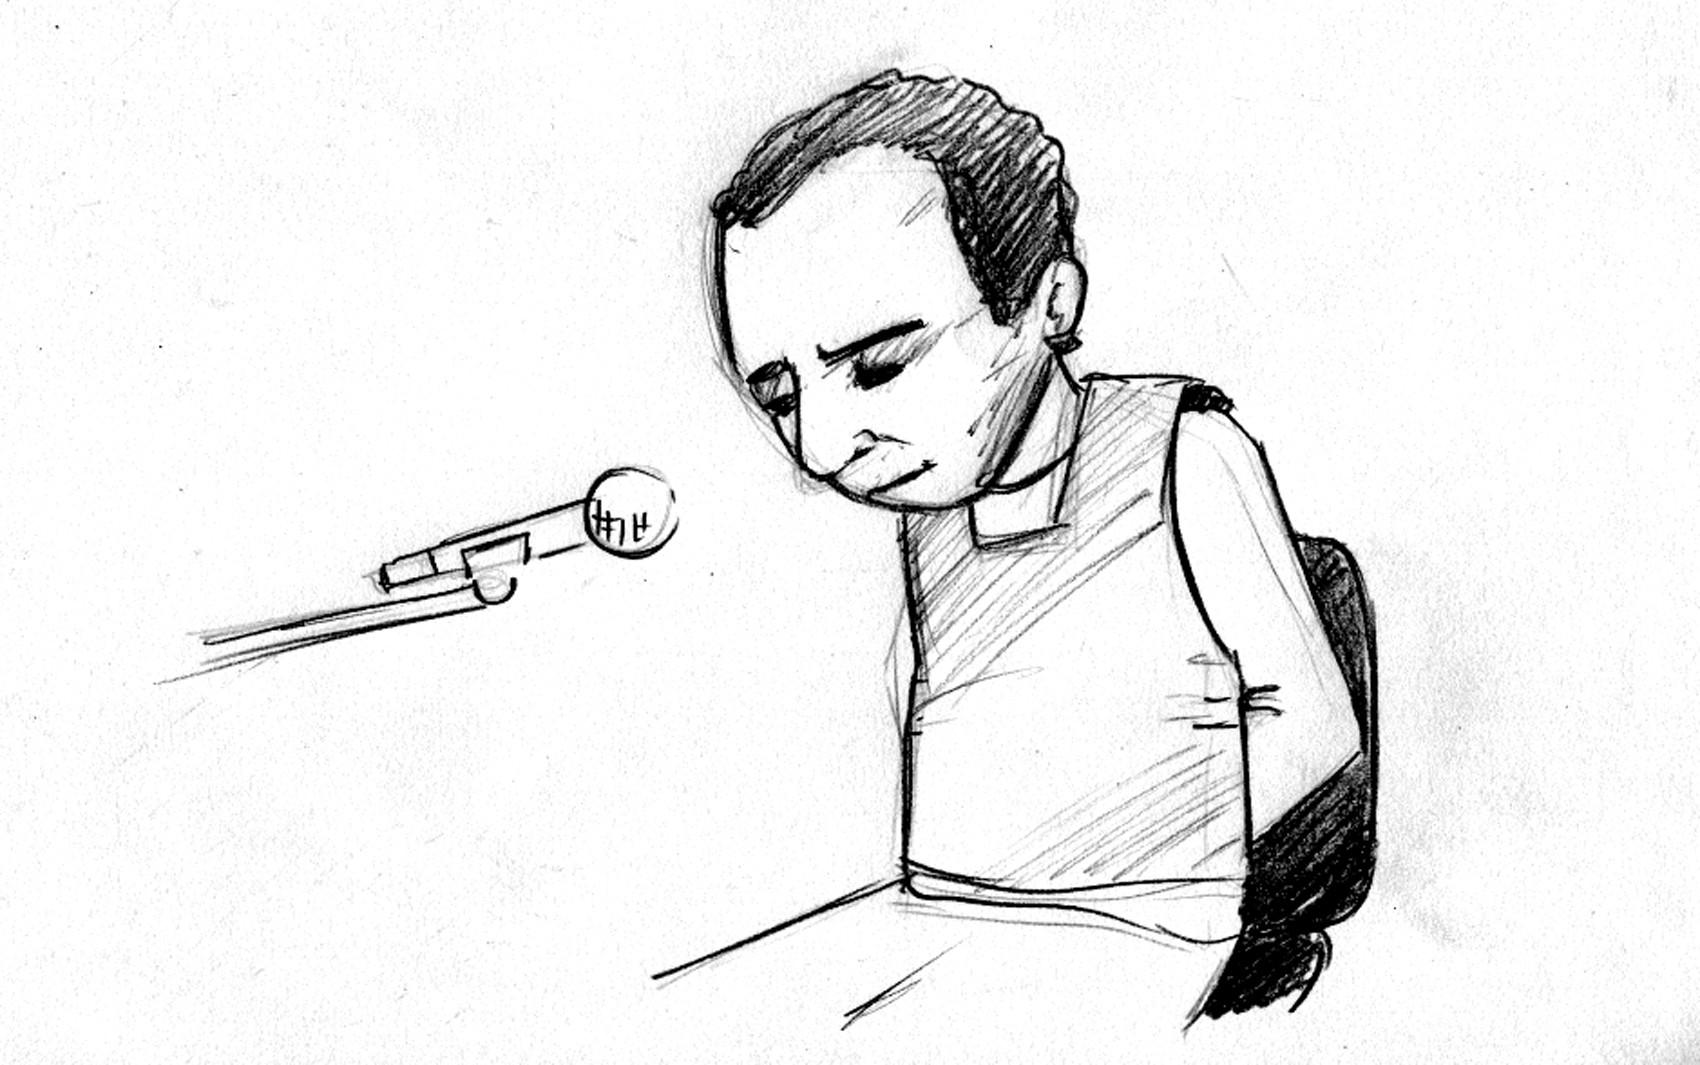 23/04/2 - O presidiário Jaílson Alves de Oliveira, que é testemunha de acusação no Caso Eliza Samudio. (Foto: Ramon Faria/TV Globo)